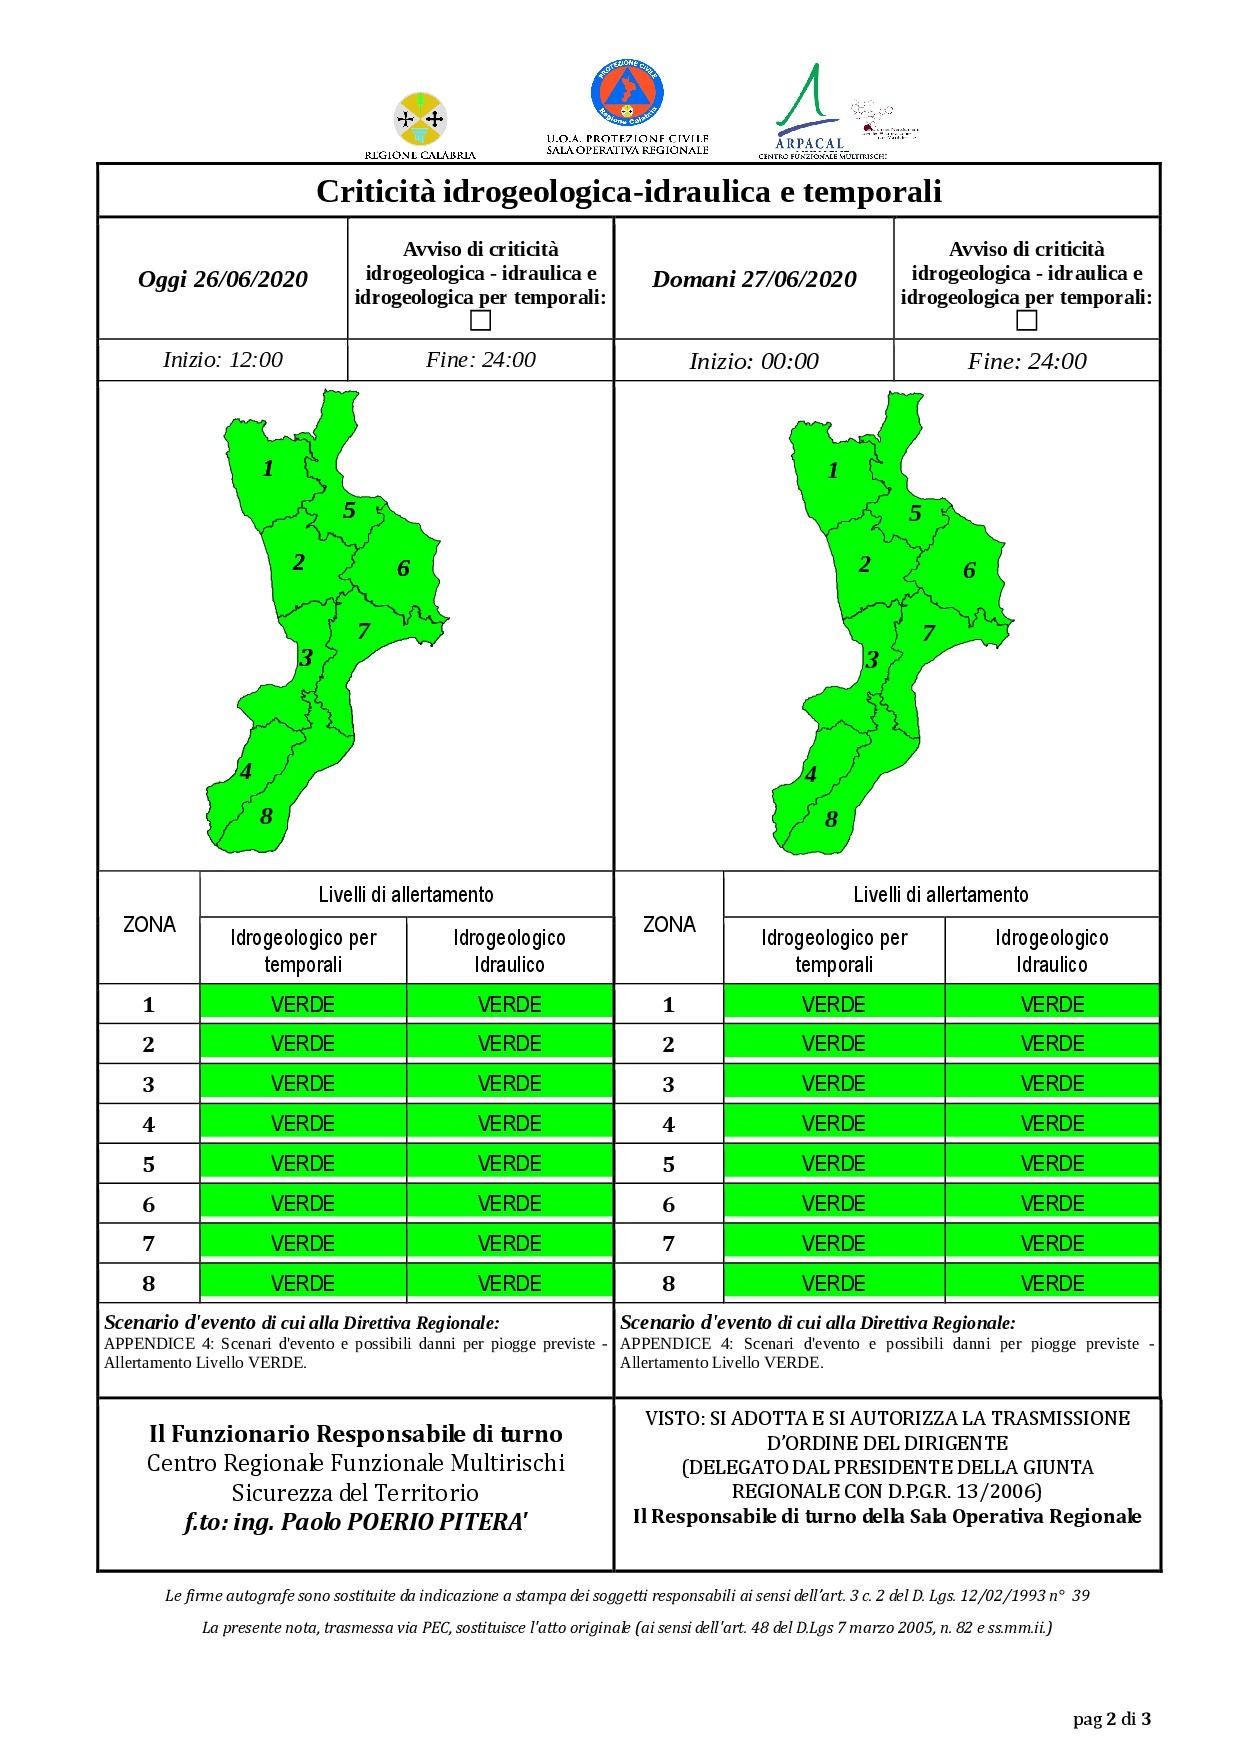 Criticità idrogeologica-idraulica e temporali in Calabria 26-06-2020